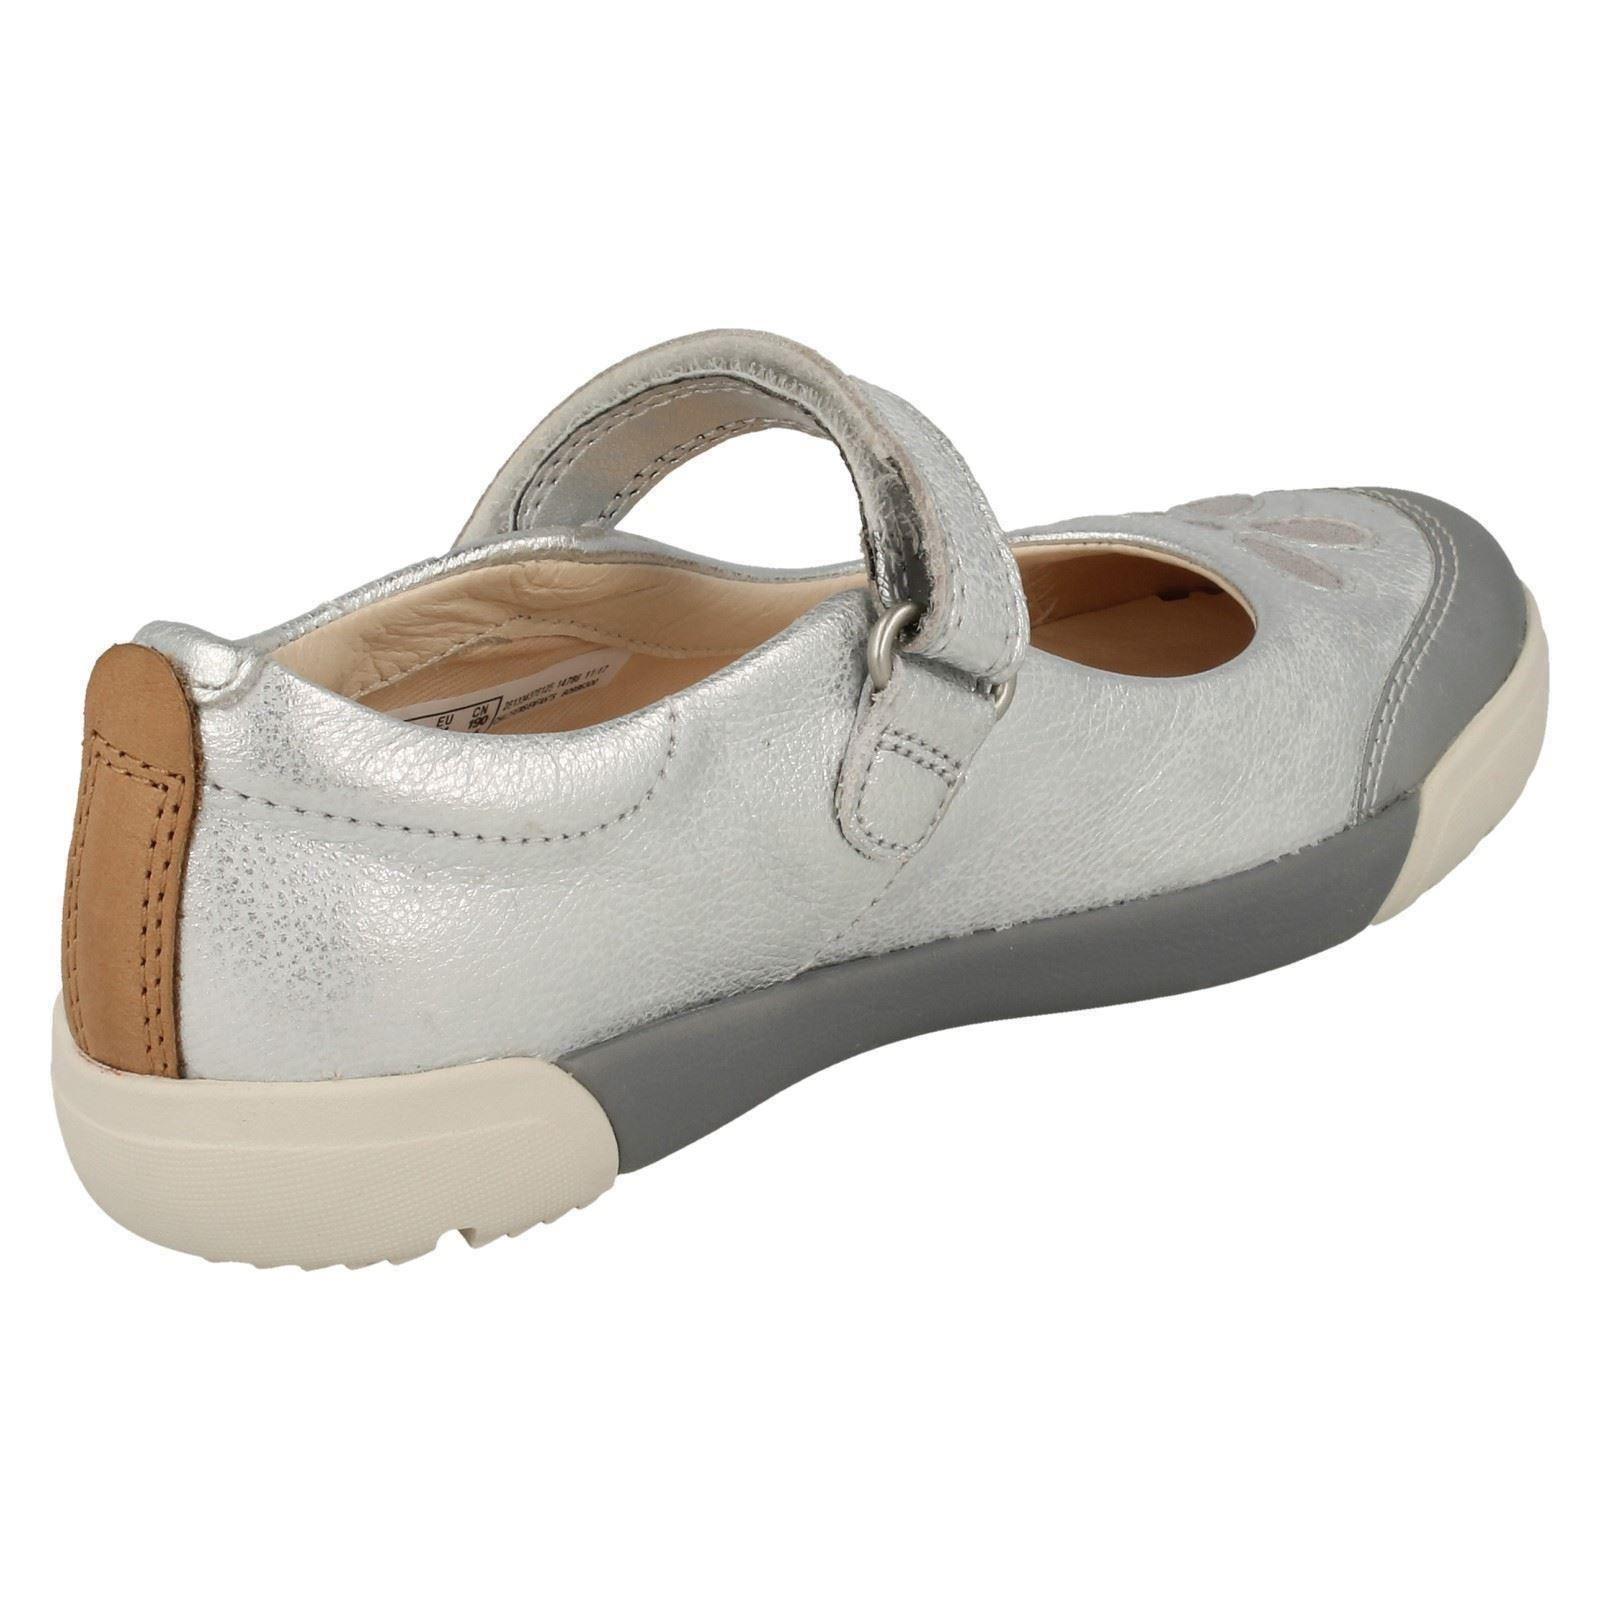 Mini Eden * Girls Clarks Mary Jane Style Shoes